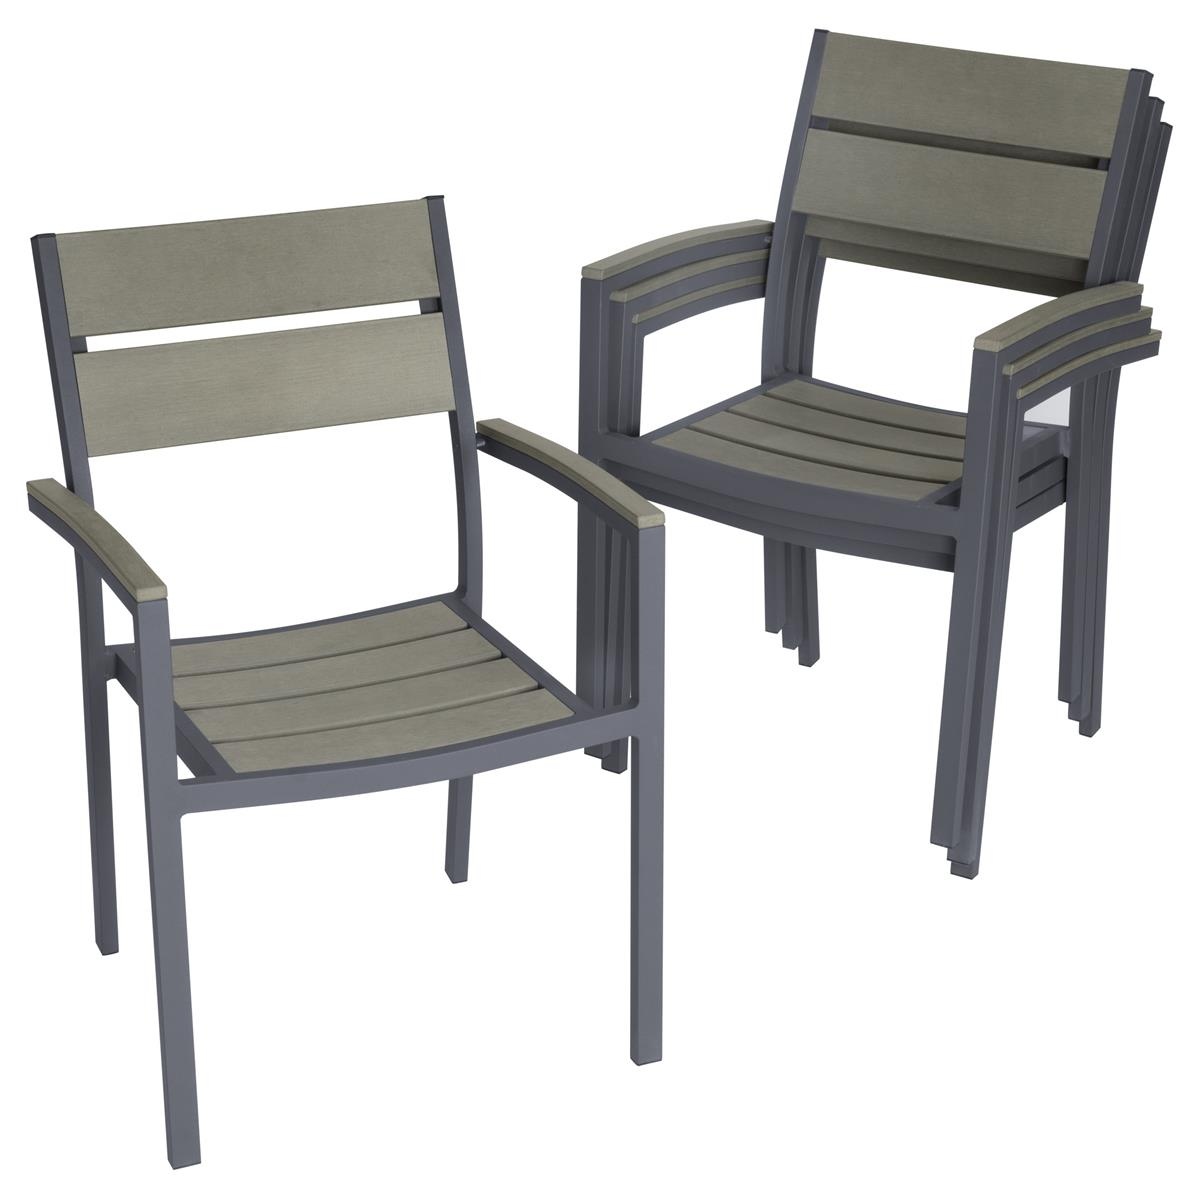 4er Set Gartenstuhl mit Armlehnen Aluminium Polywood Stapelstuhl 54 x 55 x 82 cm